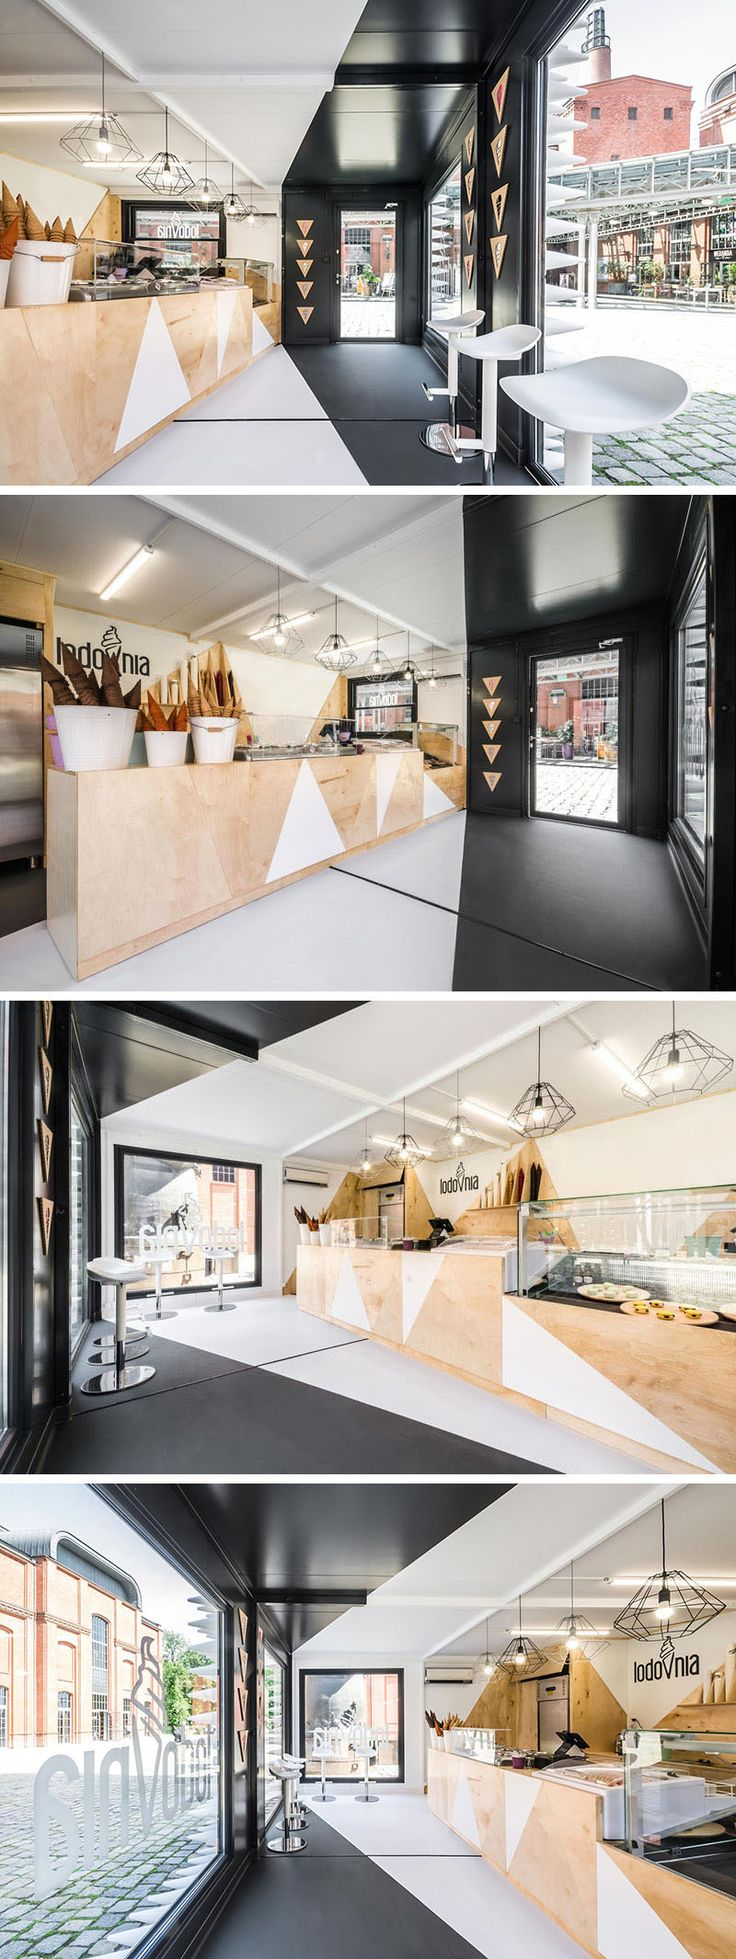 Almost 1000 Cones Cover This Ice Cream Shop In Poland